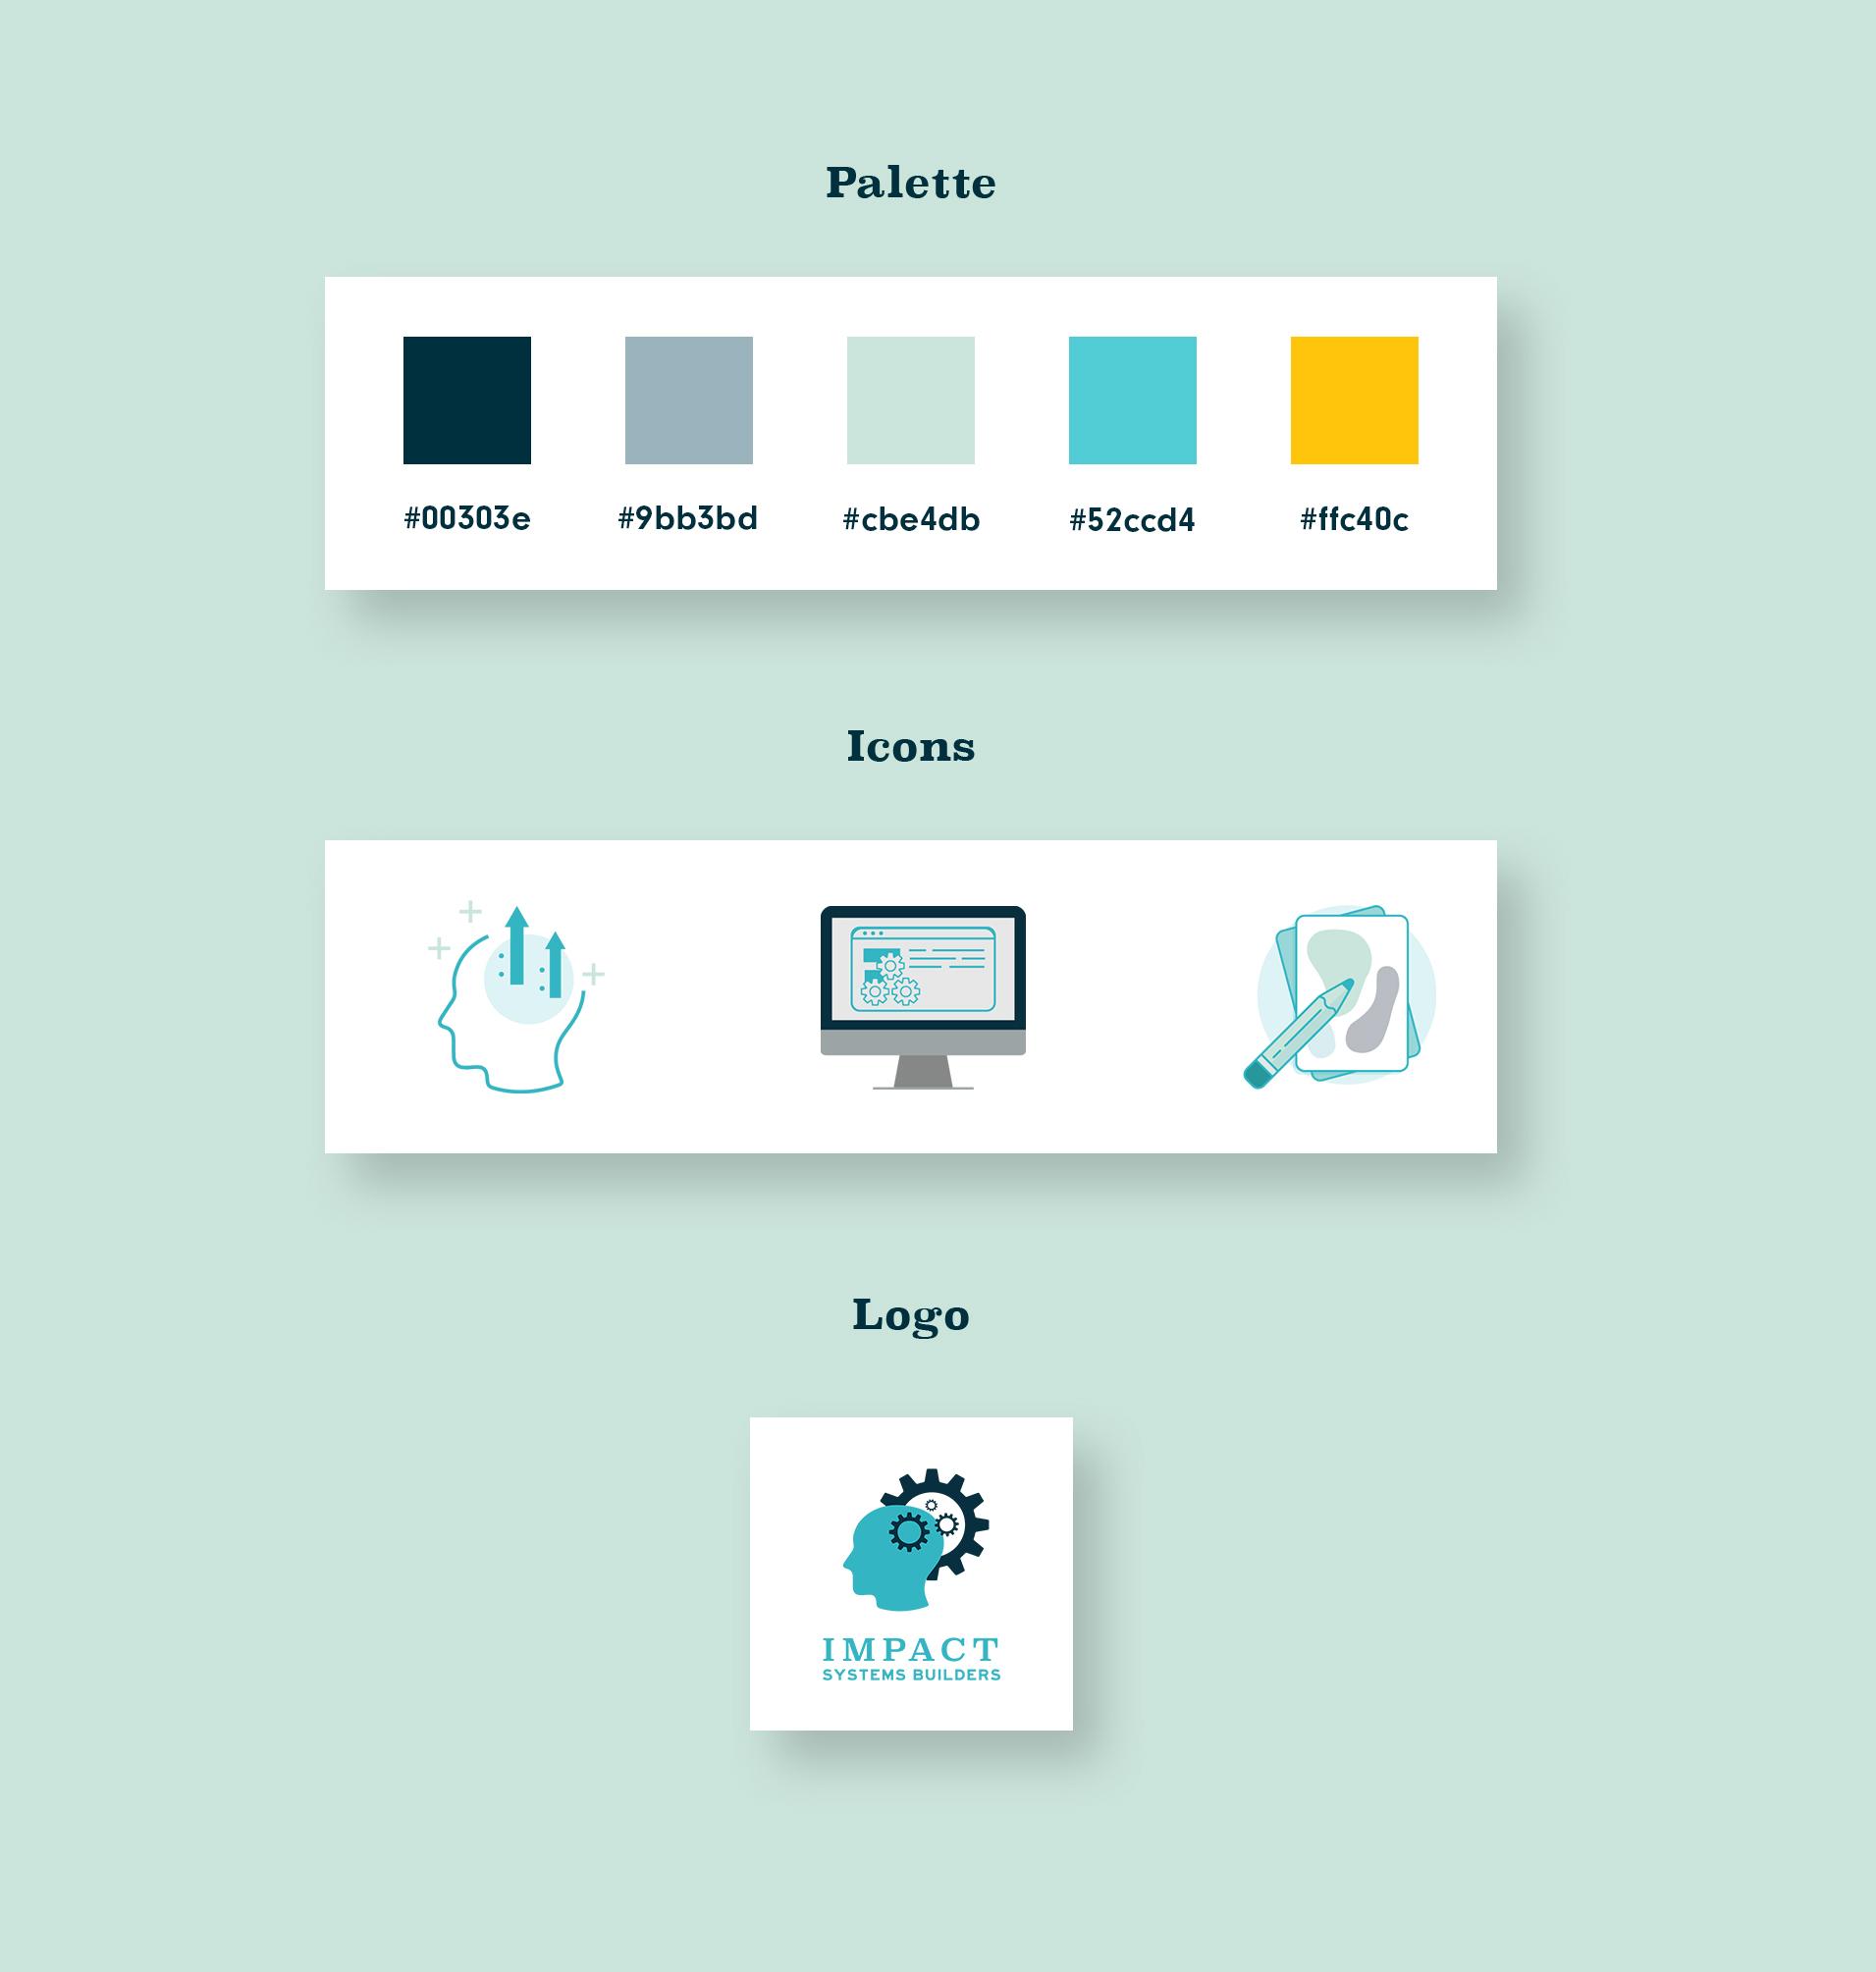 Impact-Systems-Builders-Website-Details.jpeg